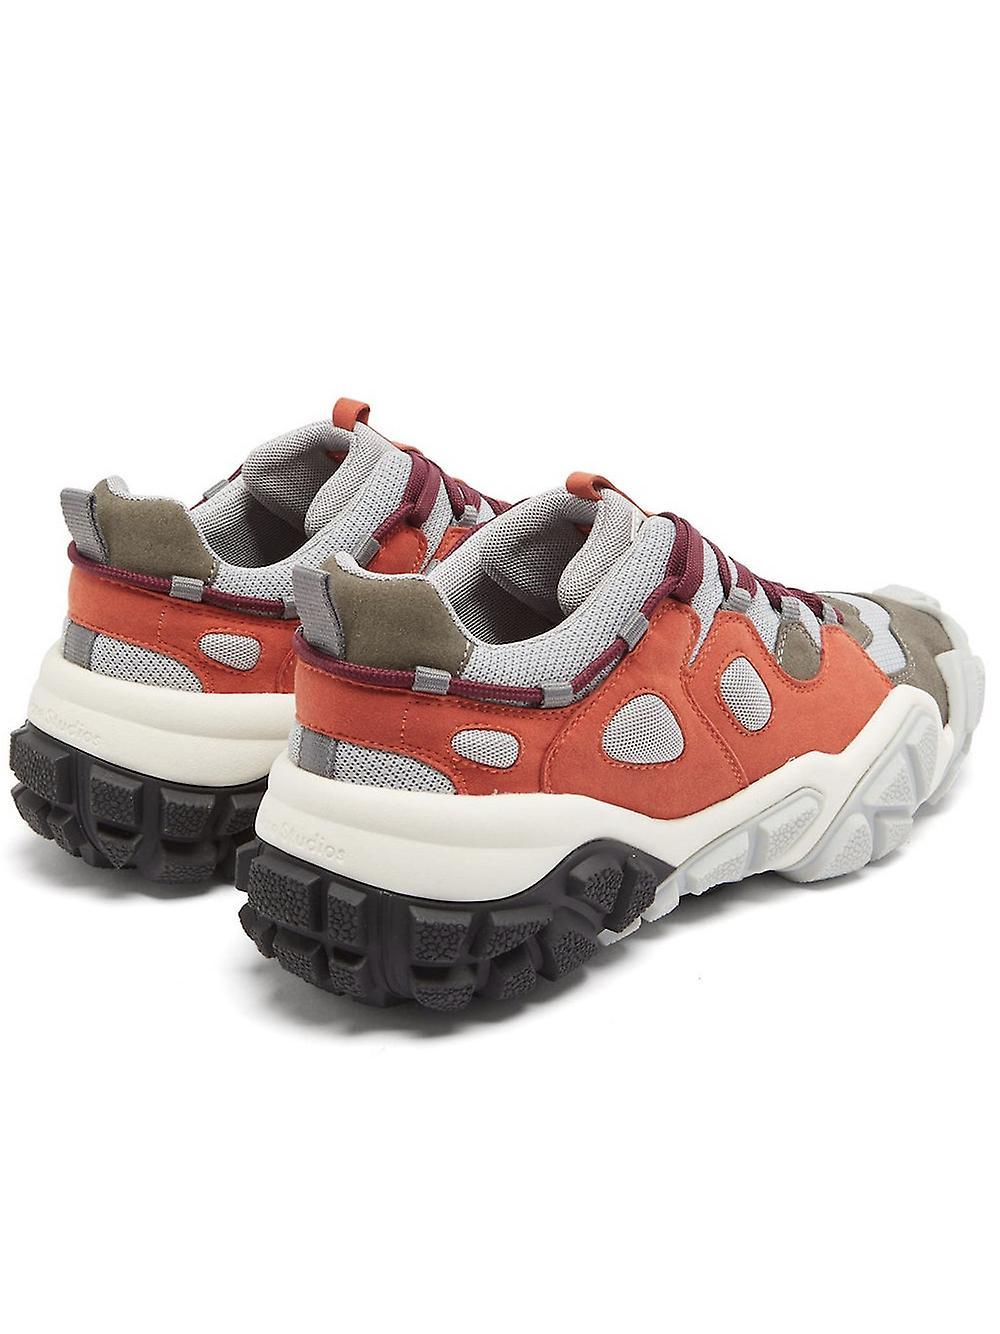 Acne Studios Ezcr025002 Men's Multicolor Fabric Sneakers